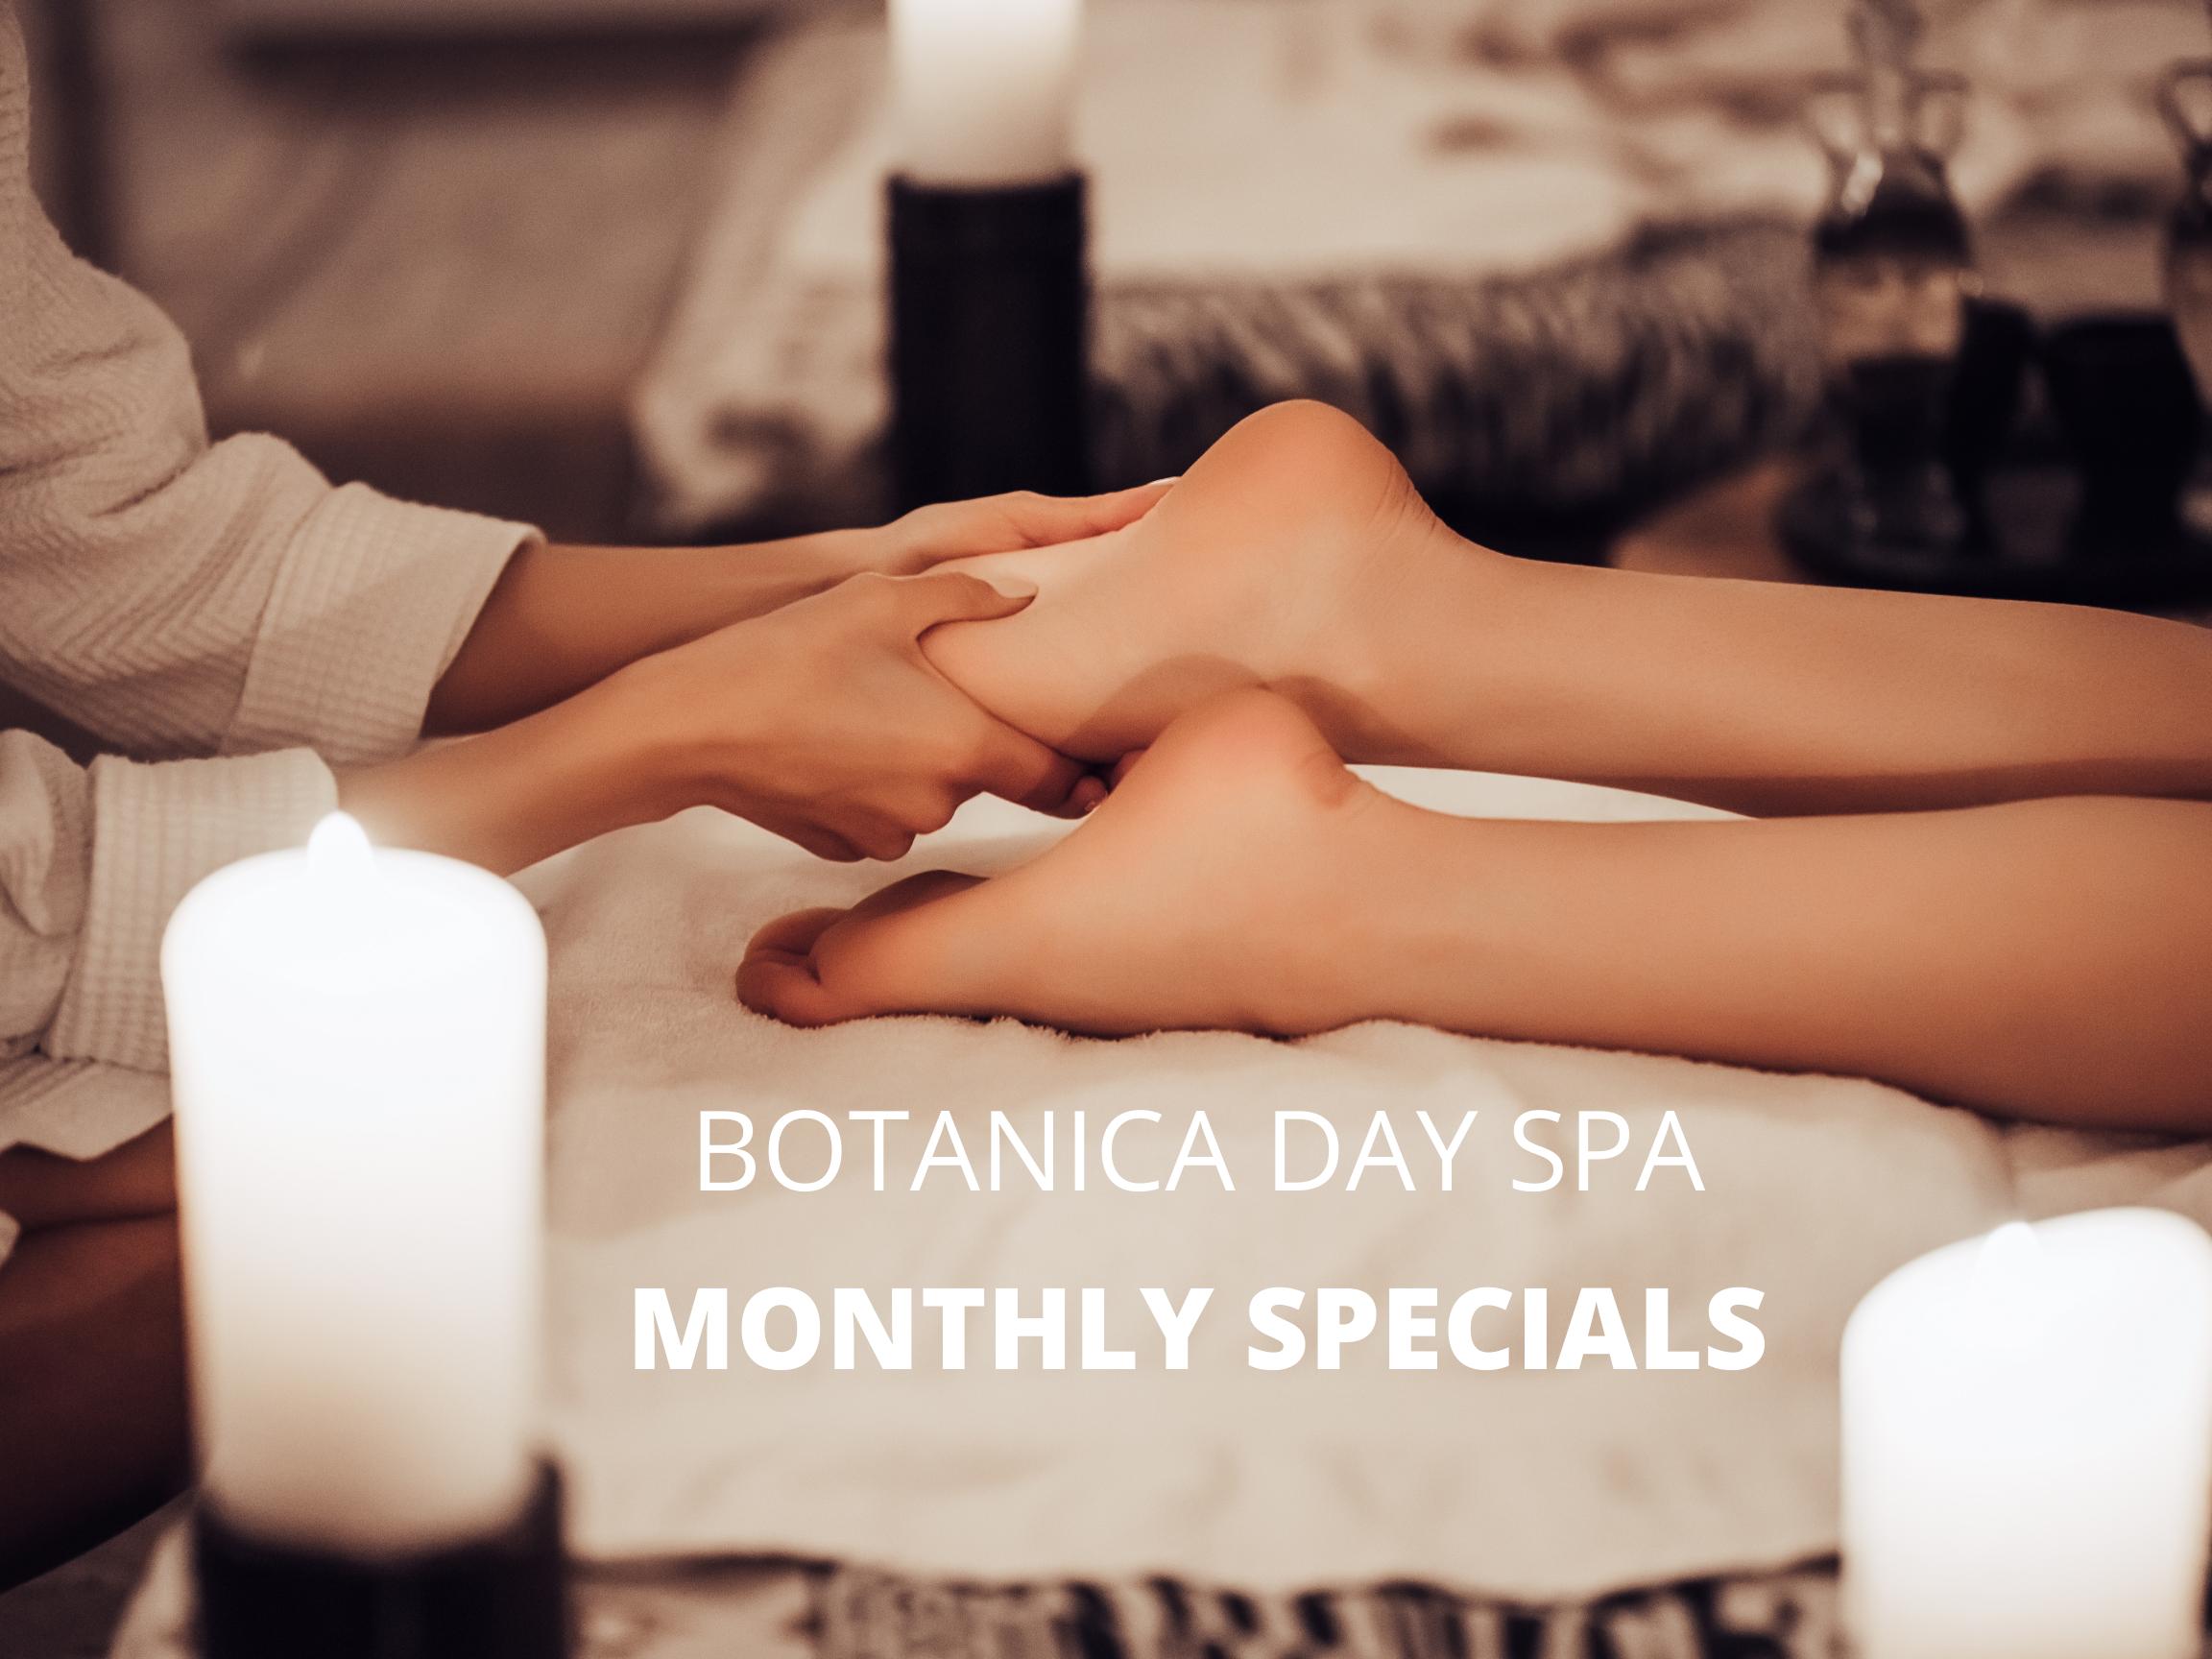 spa specials at botanica day spa